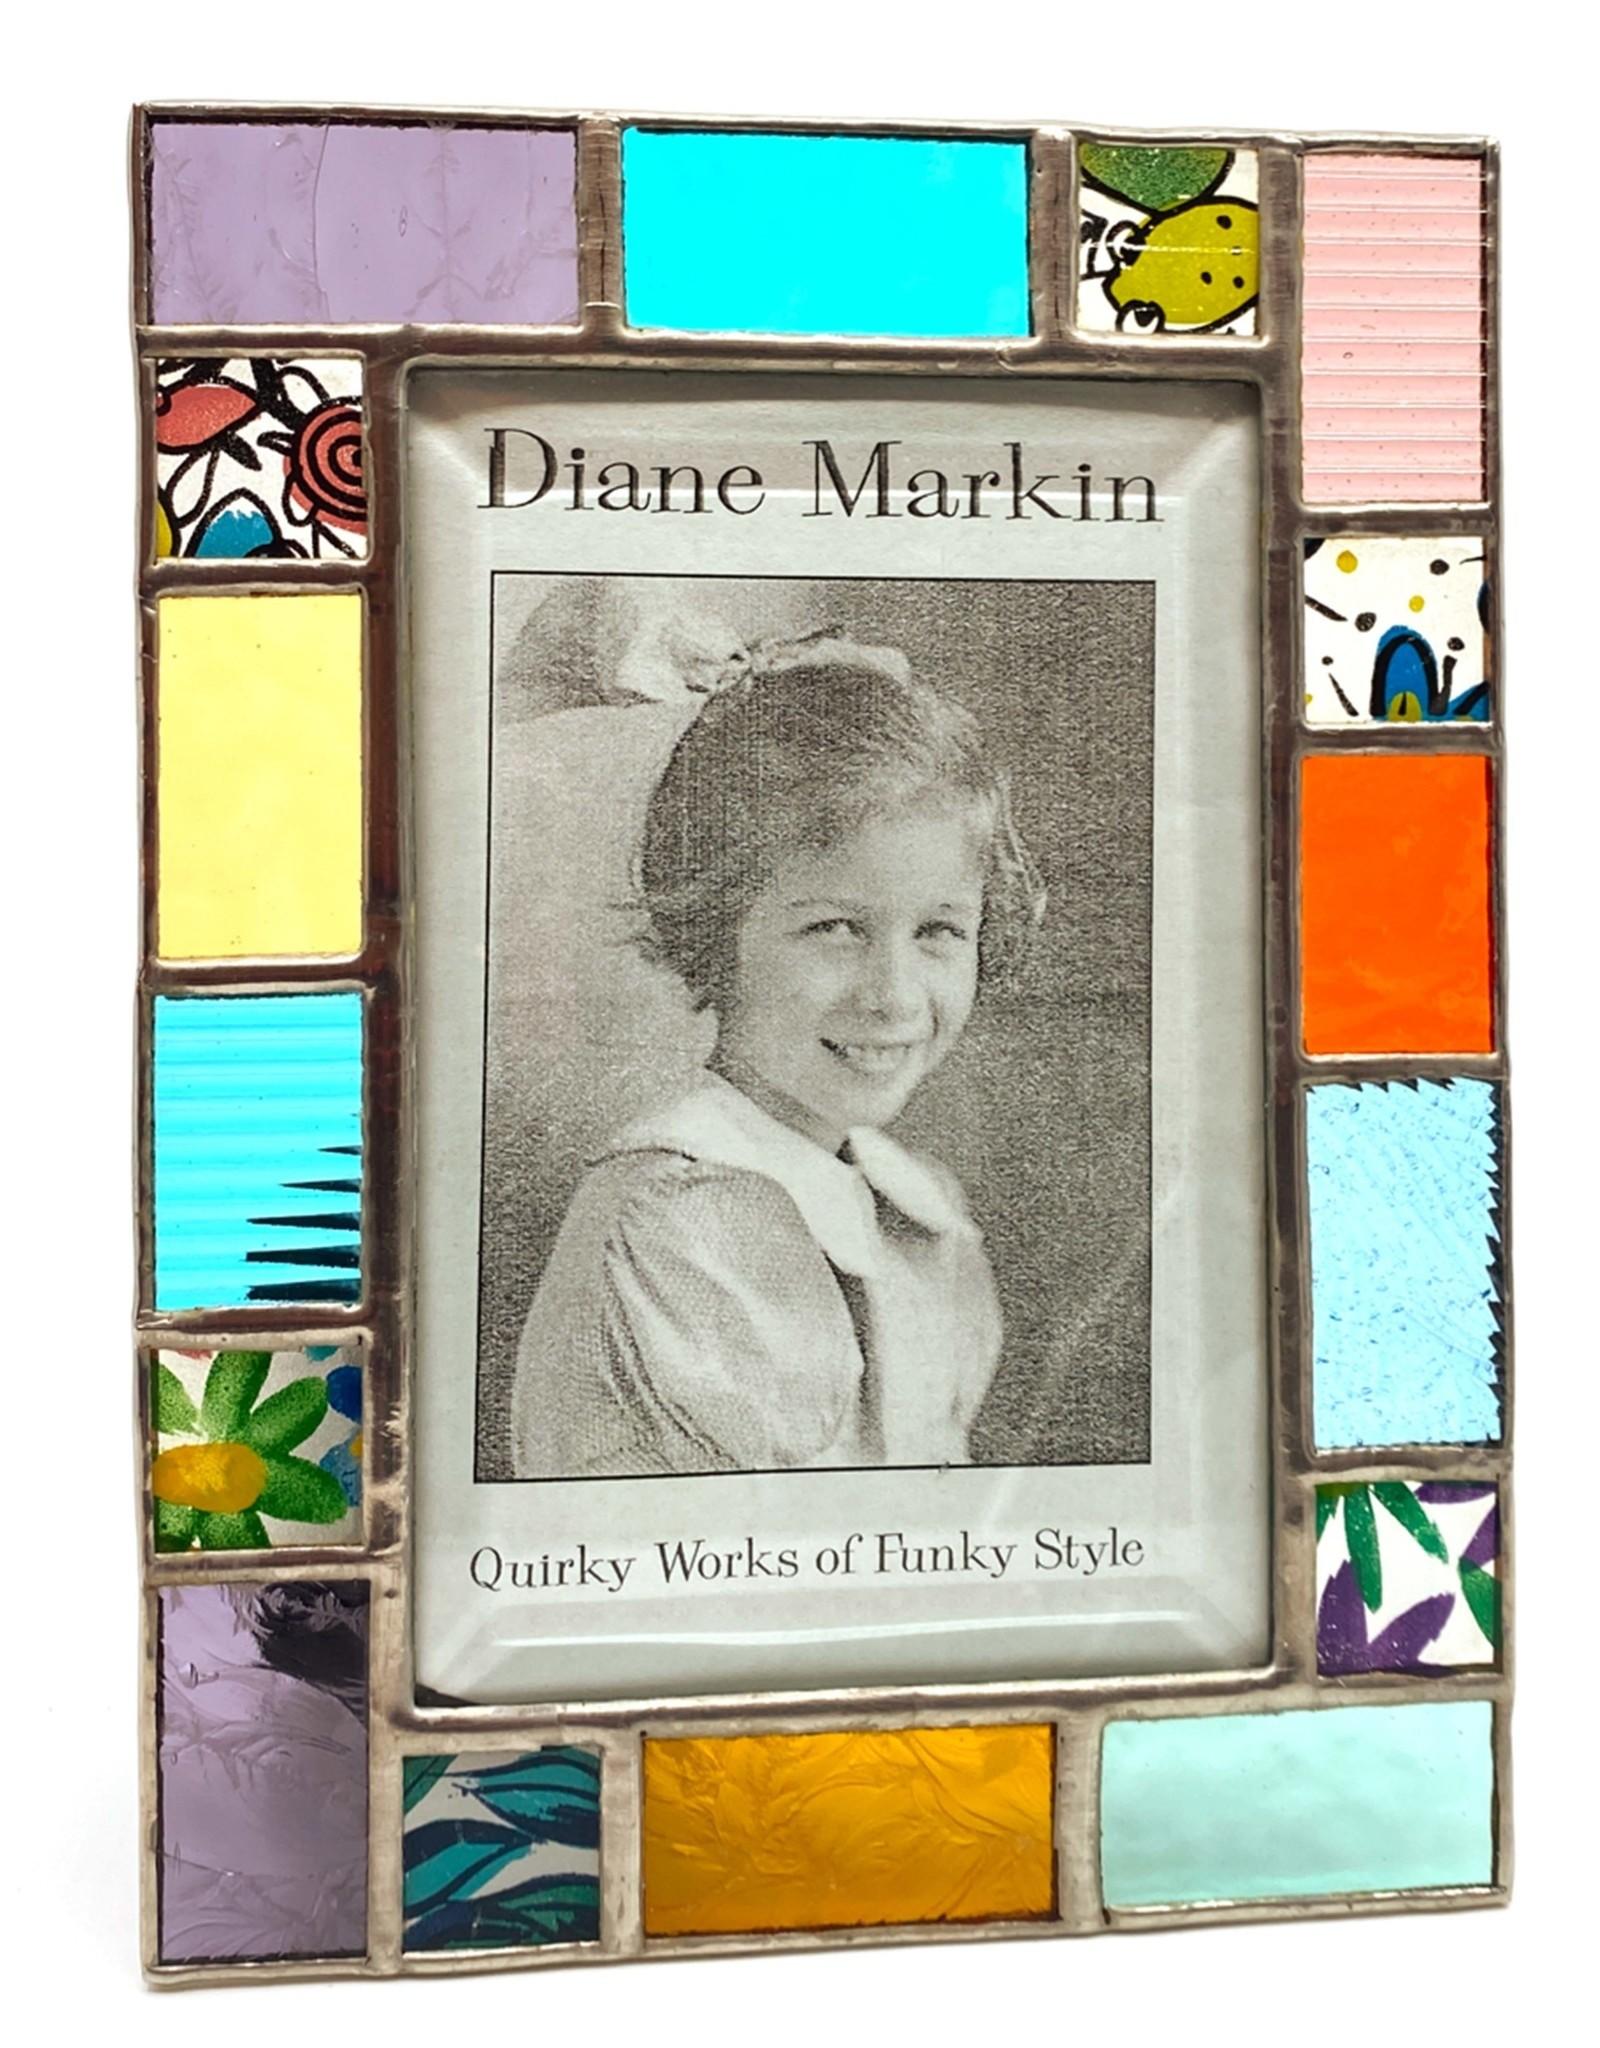 DIANE MARKIN 4X6 PETIT FOUR MULTI PICTURE FRAME